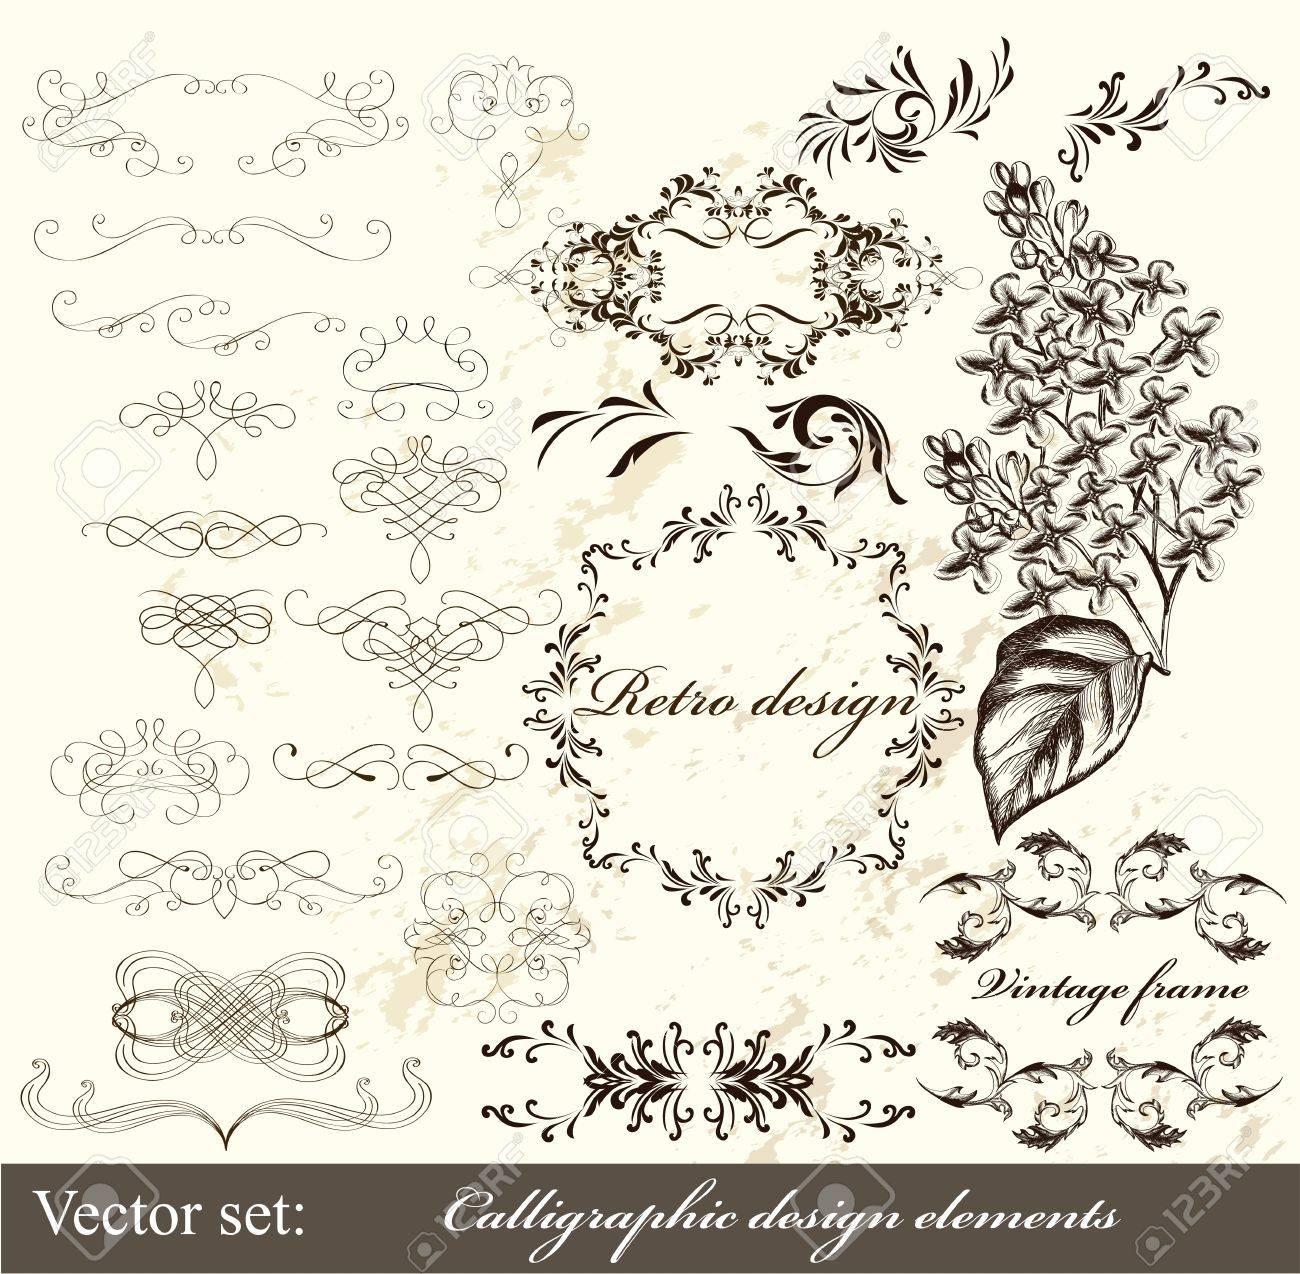 Decorative elements for elegant design  Calligraphic vector Stock Vector - 16483698